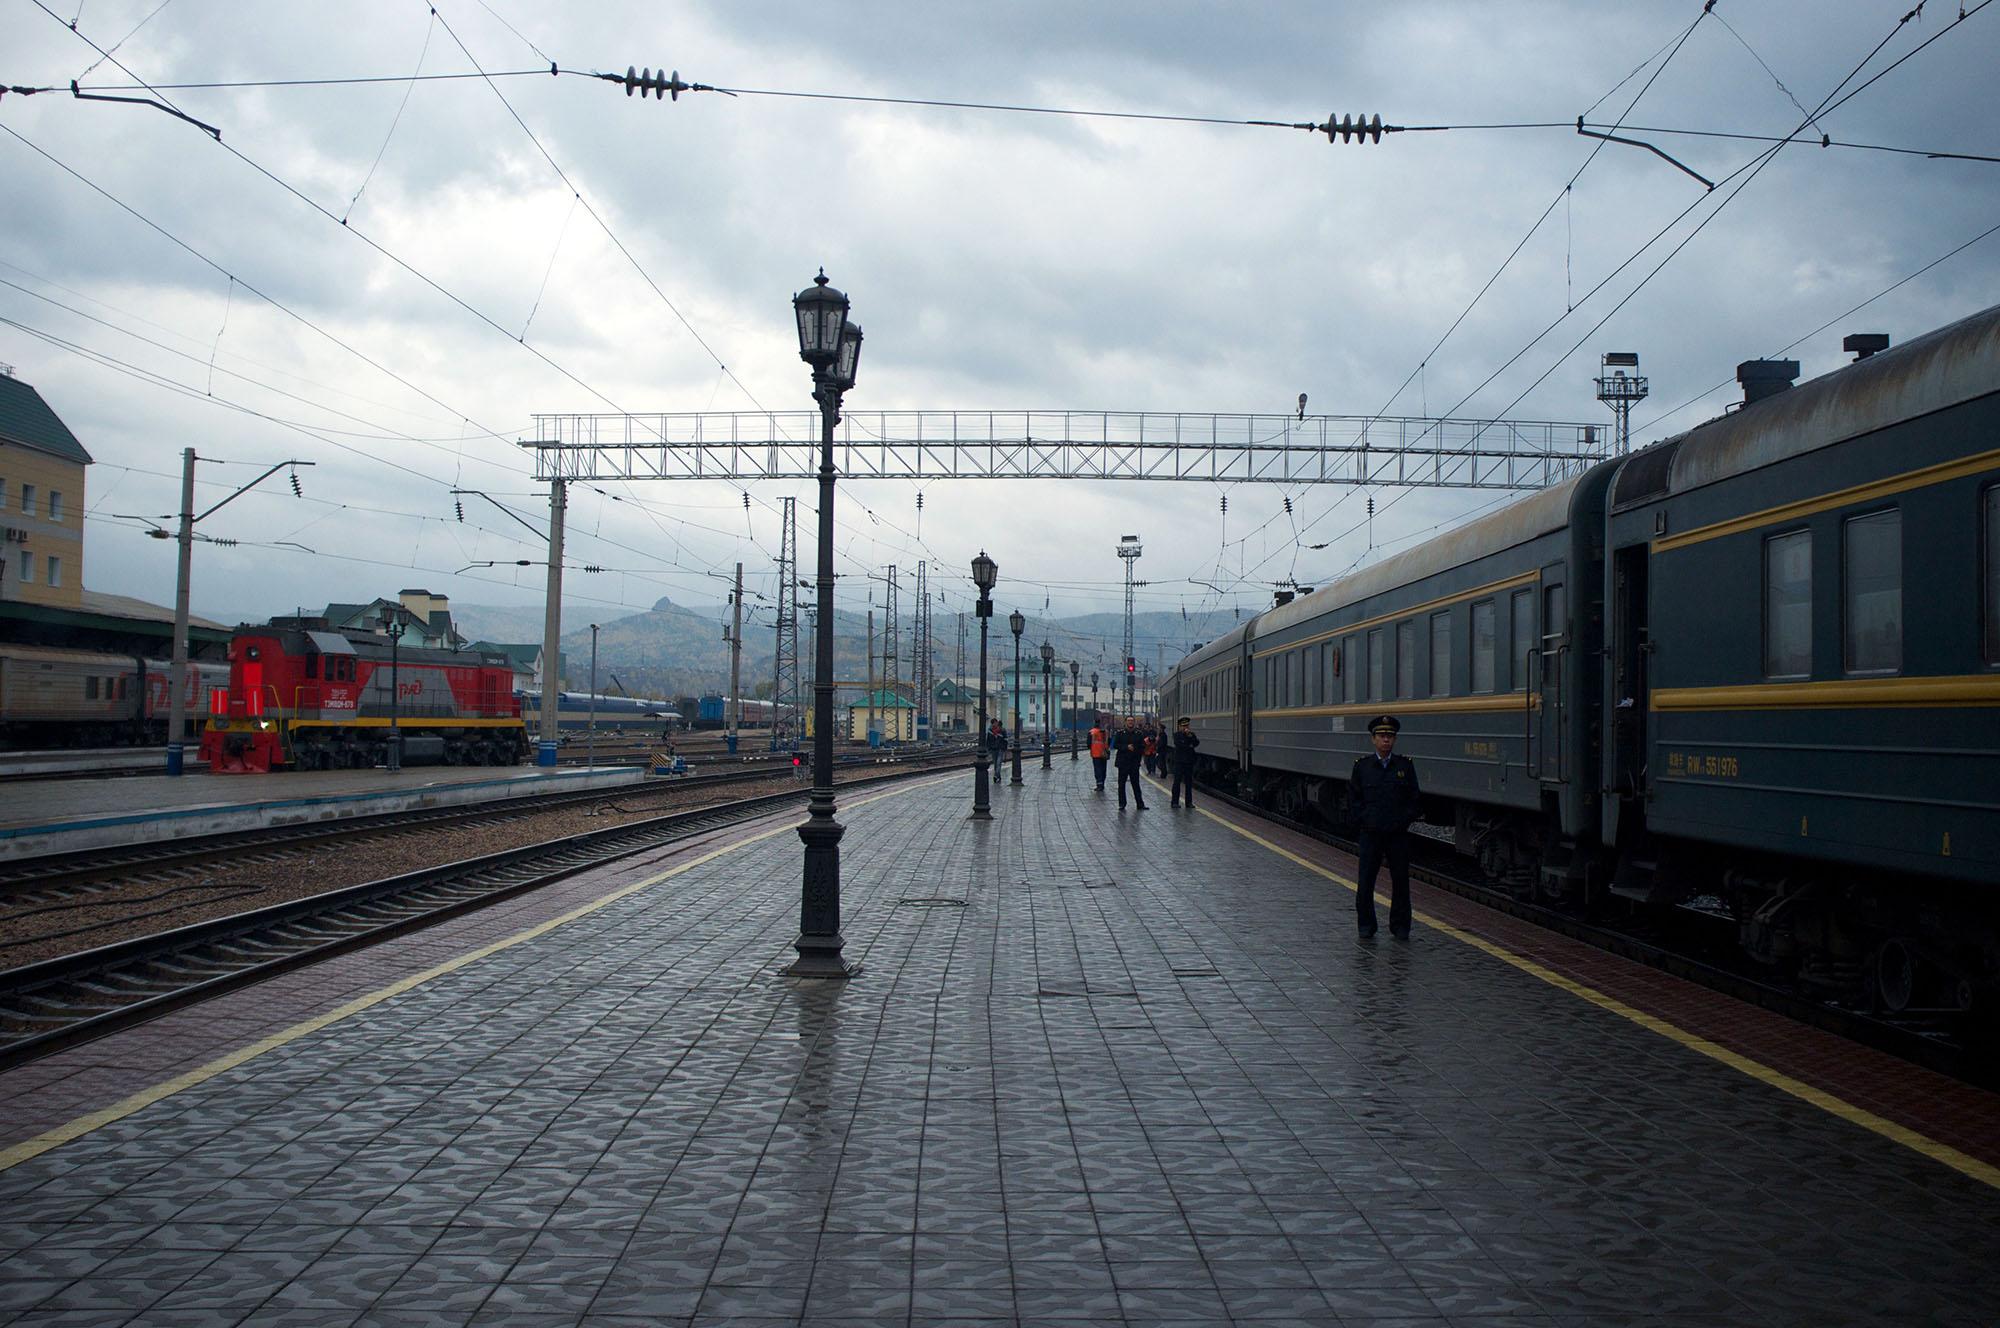 Krasnoyarsk station starting to show curvy landscape.